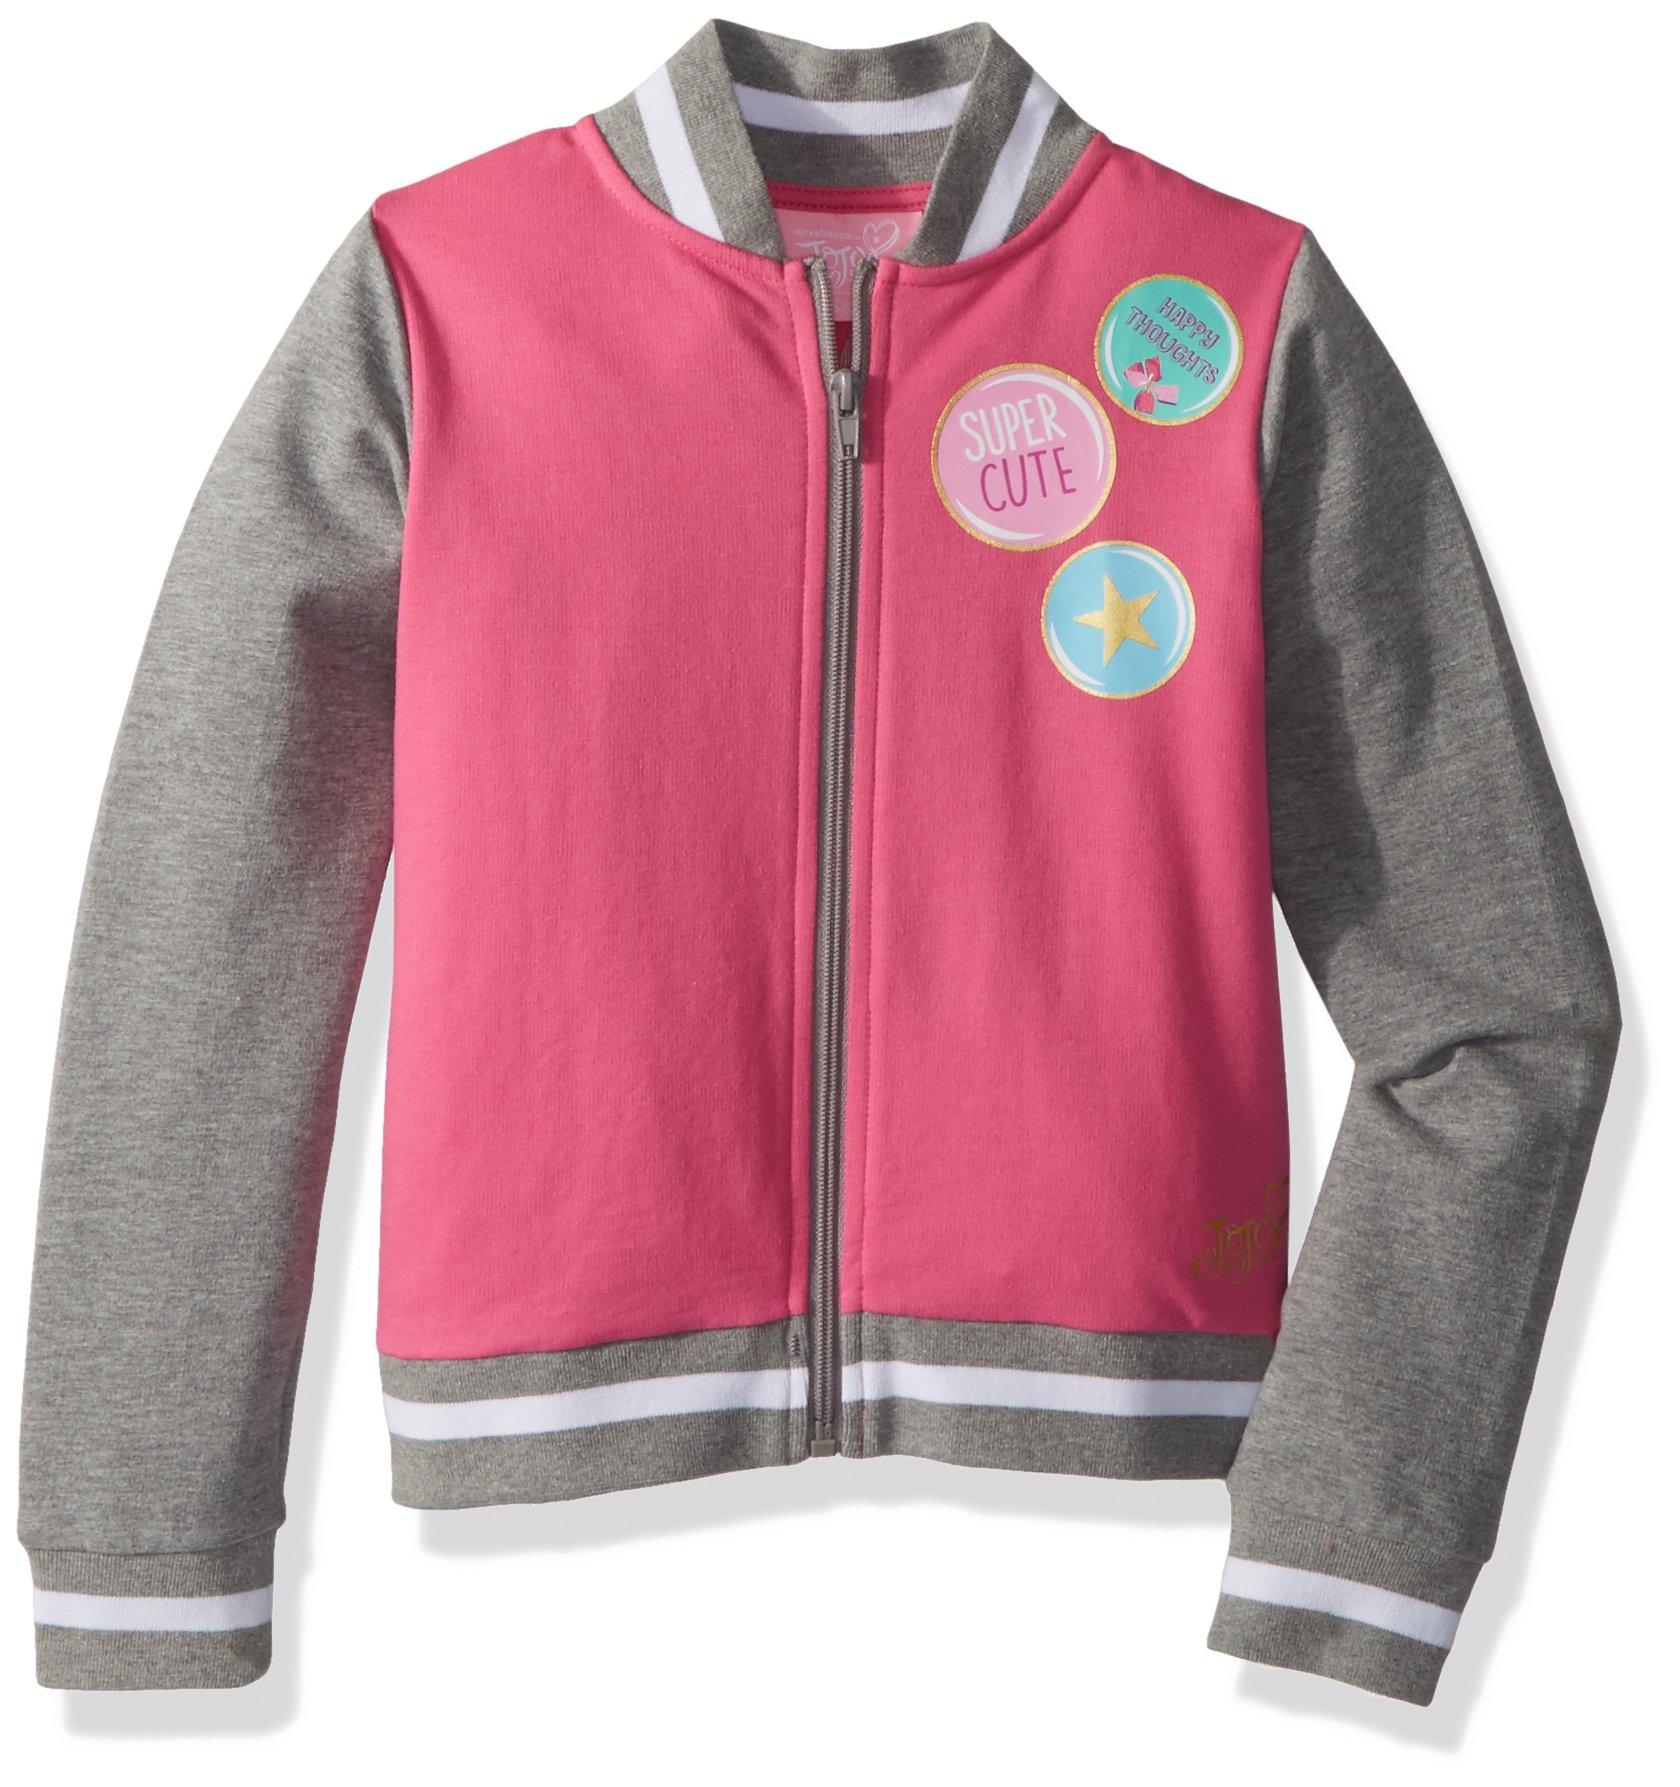 Jojo Siwa By Danskin Big Girls' Long Sleeve Jacket, Grey Heather/Pink, XS